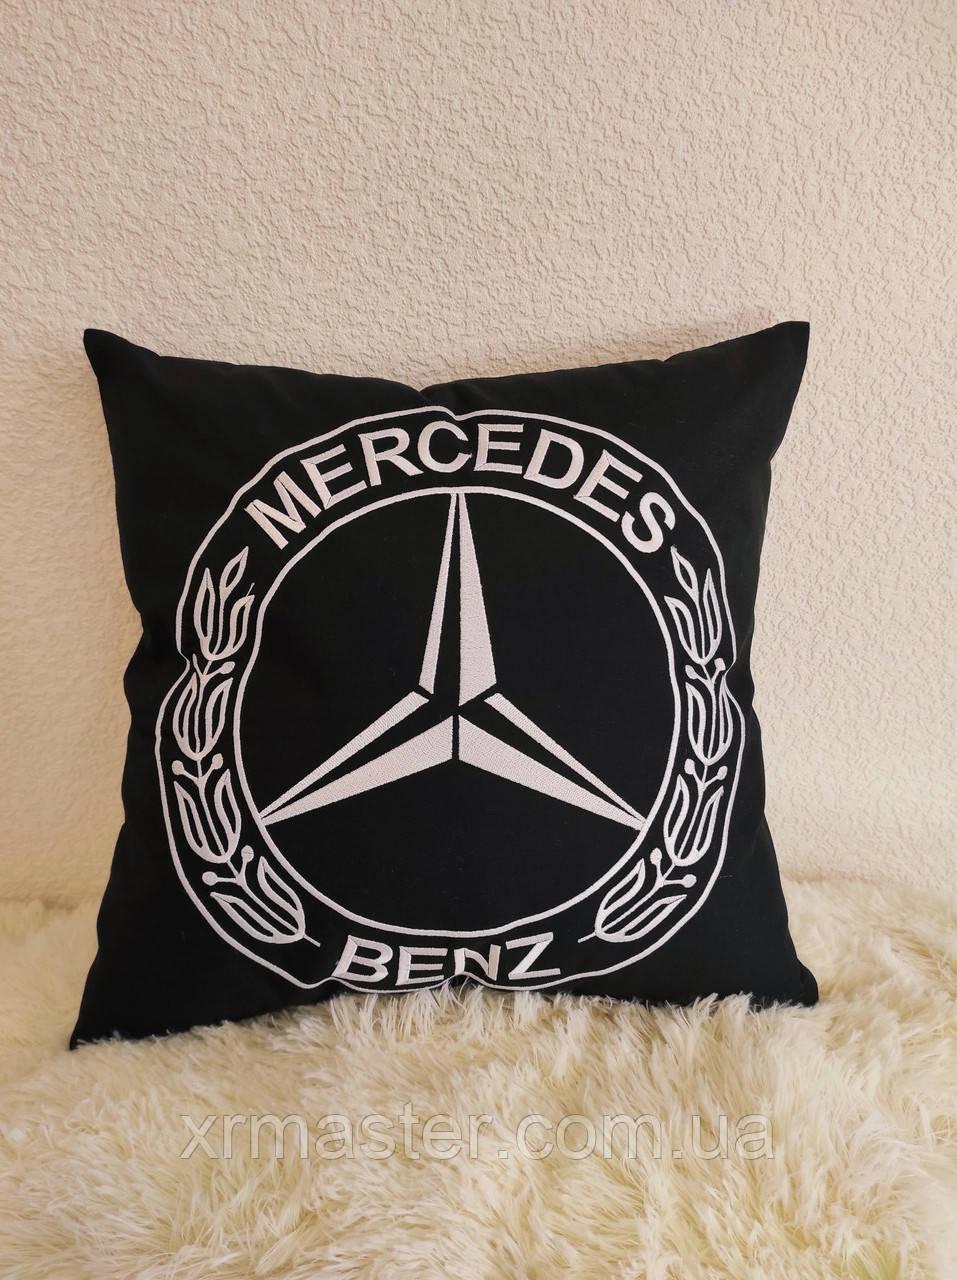 Подарочная подушка Mercedes